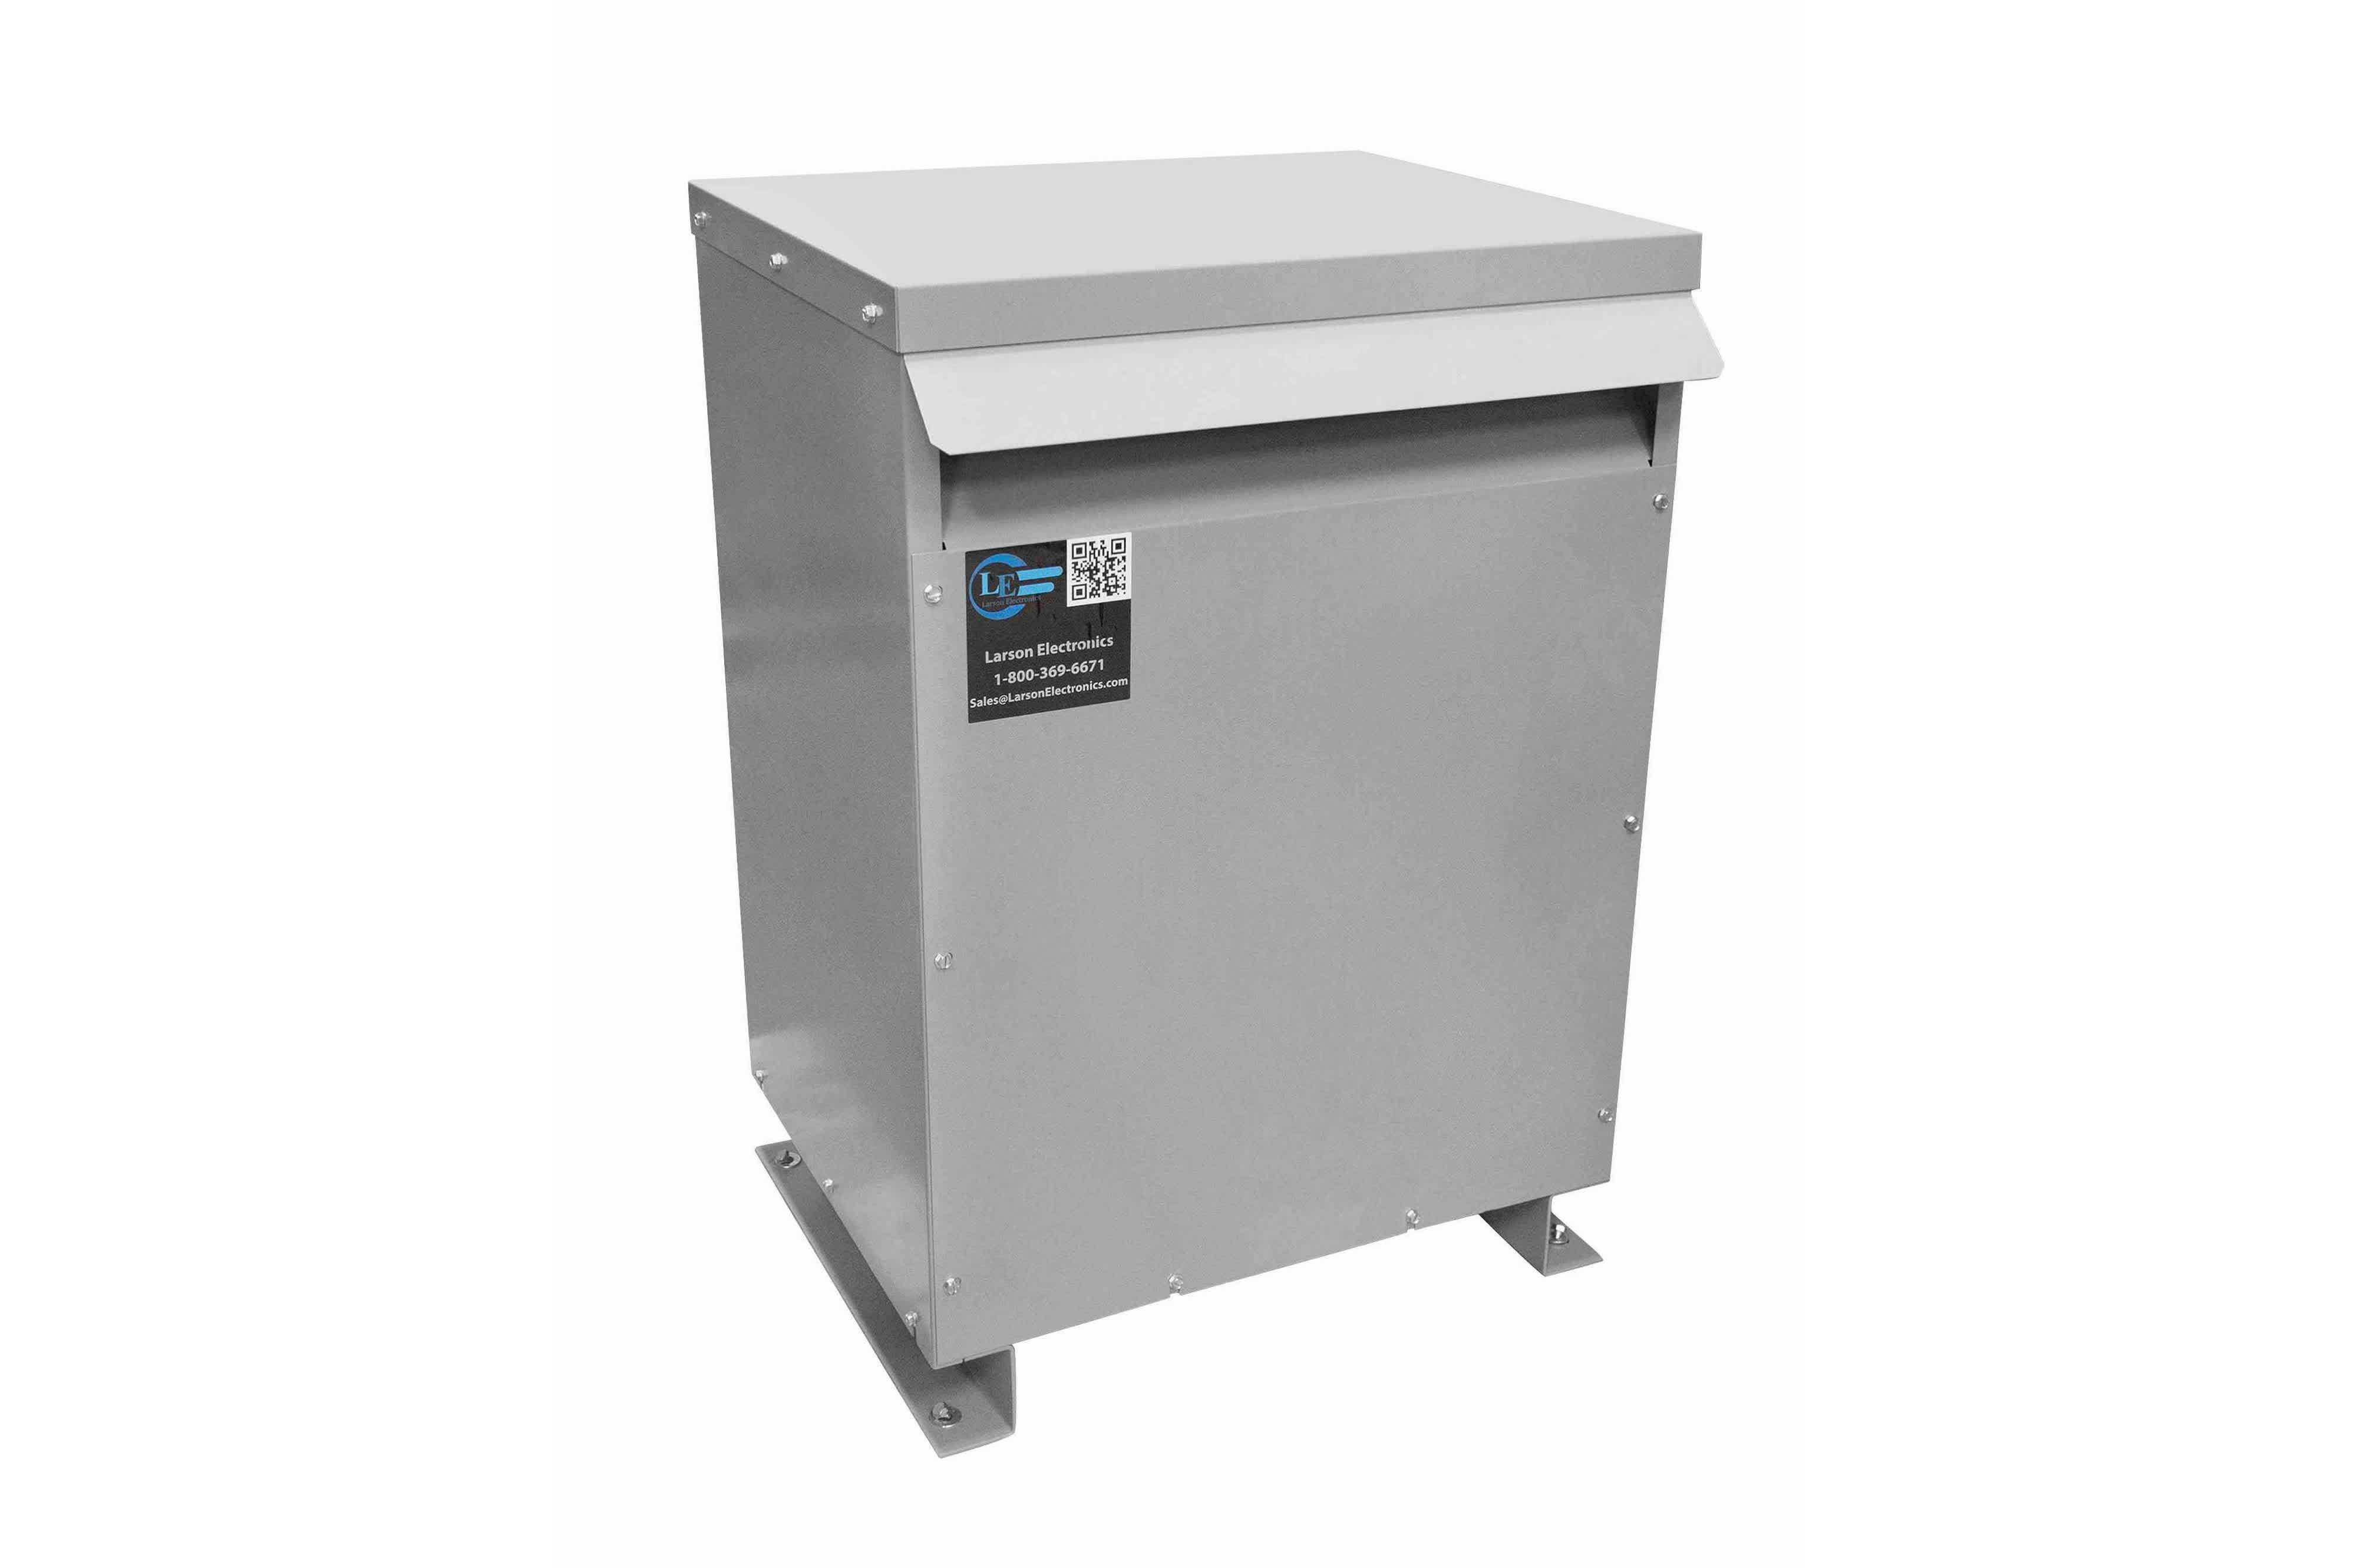 200 kVA 3PH Isolation Transformer, 460V Wye Primary, 575V Delta Secondary, N3R, Ventilated, 60 Hz